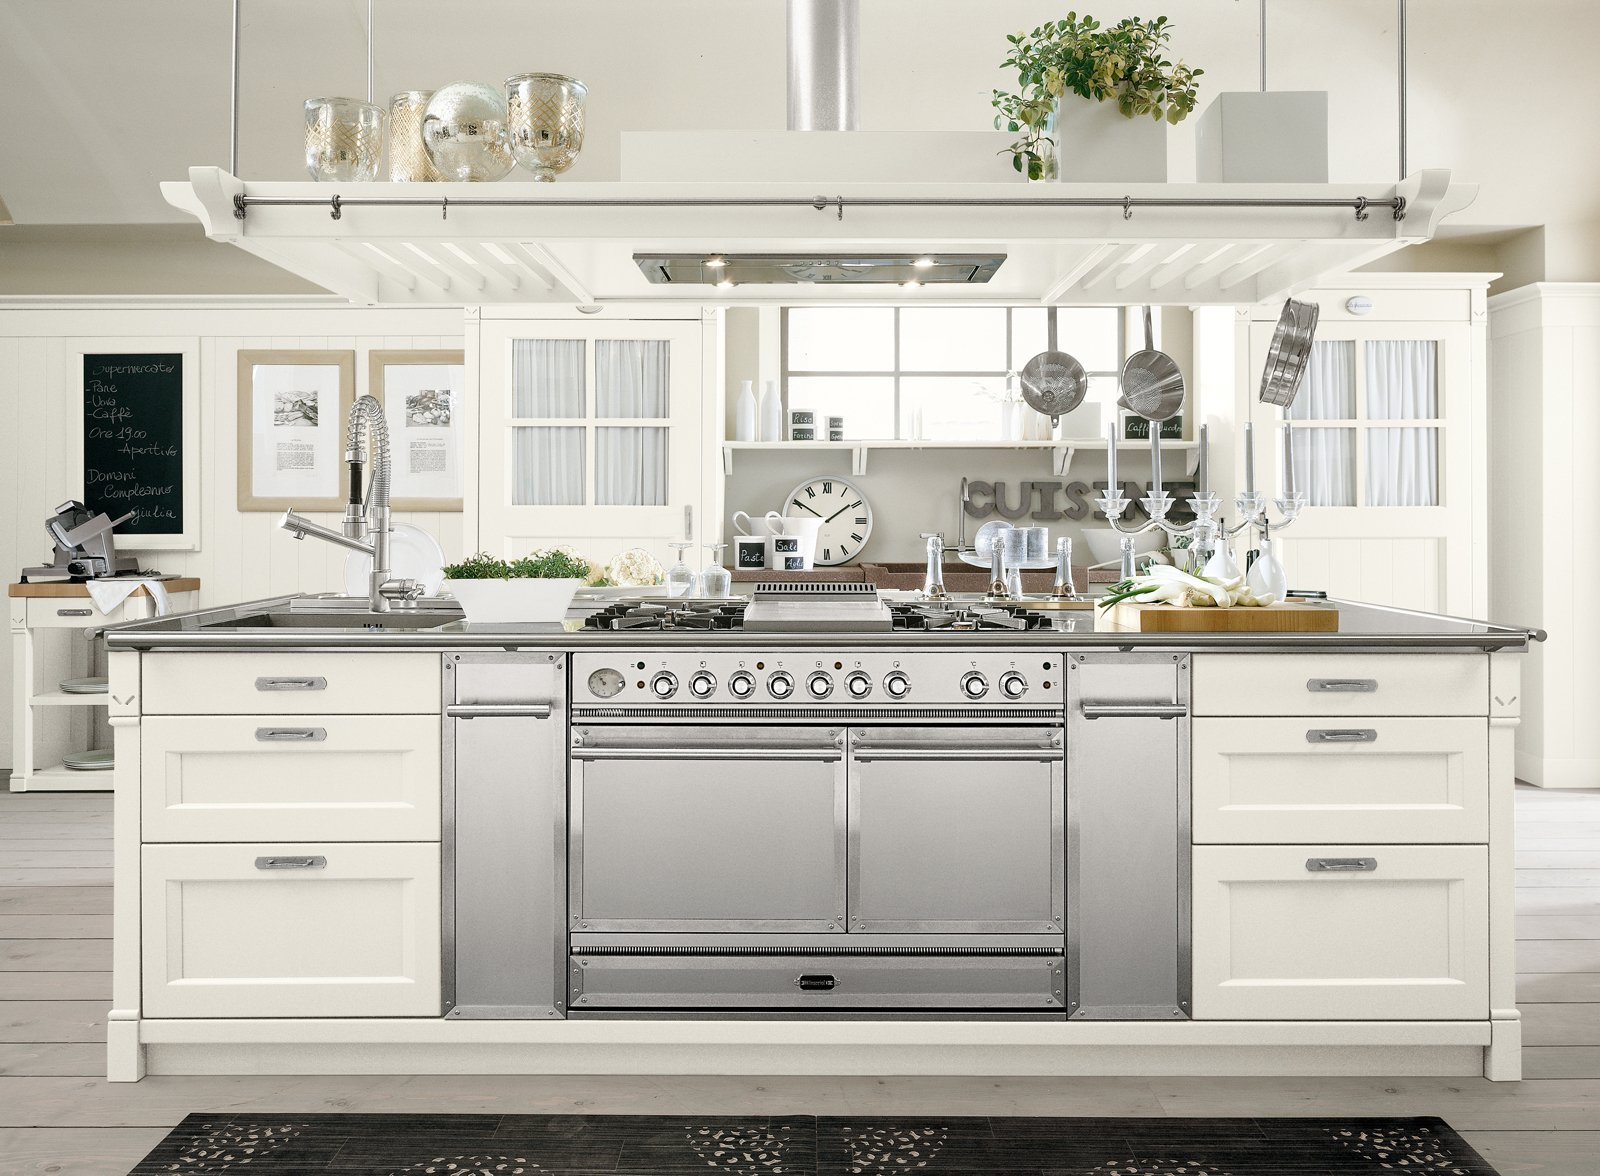 Cucine country una scelta di stile cose di casa for Cucina americana arredamento